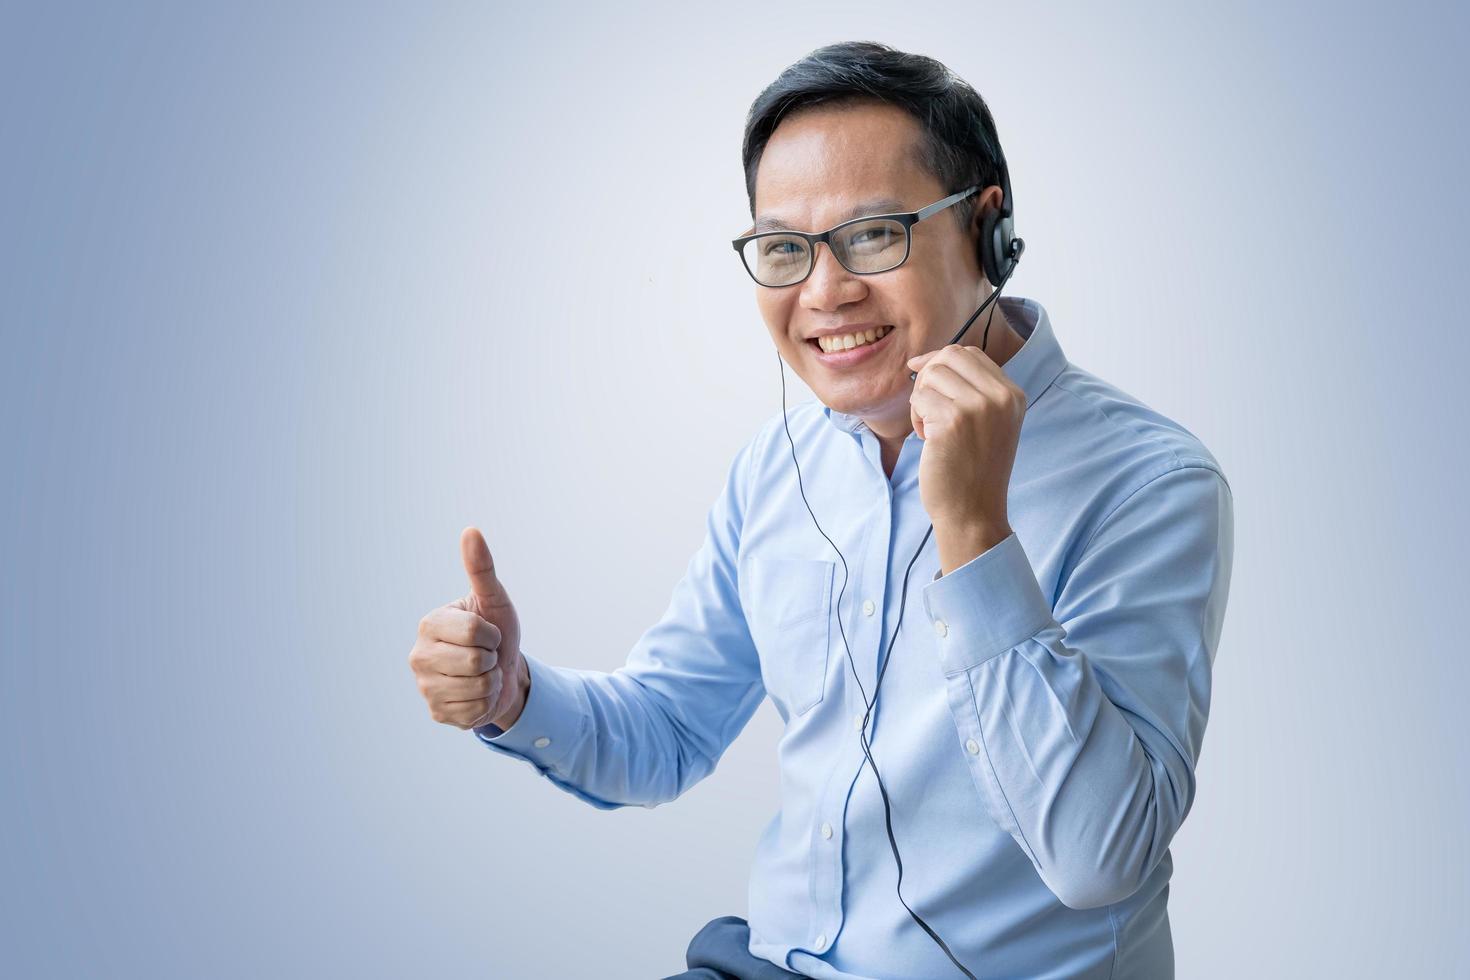 medelålders man tar samtal på headset isolerad på blå bakgrund foto